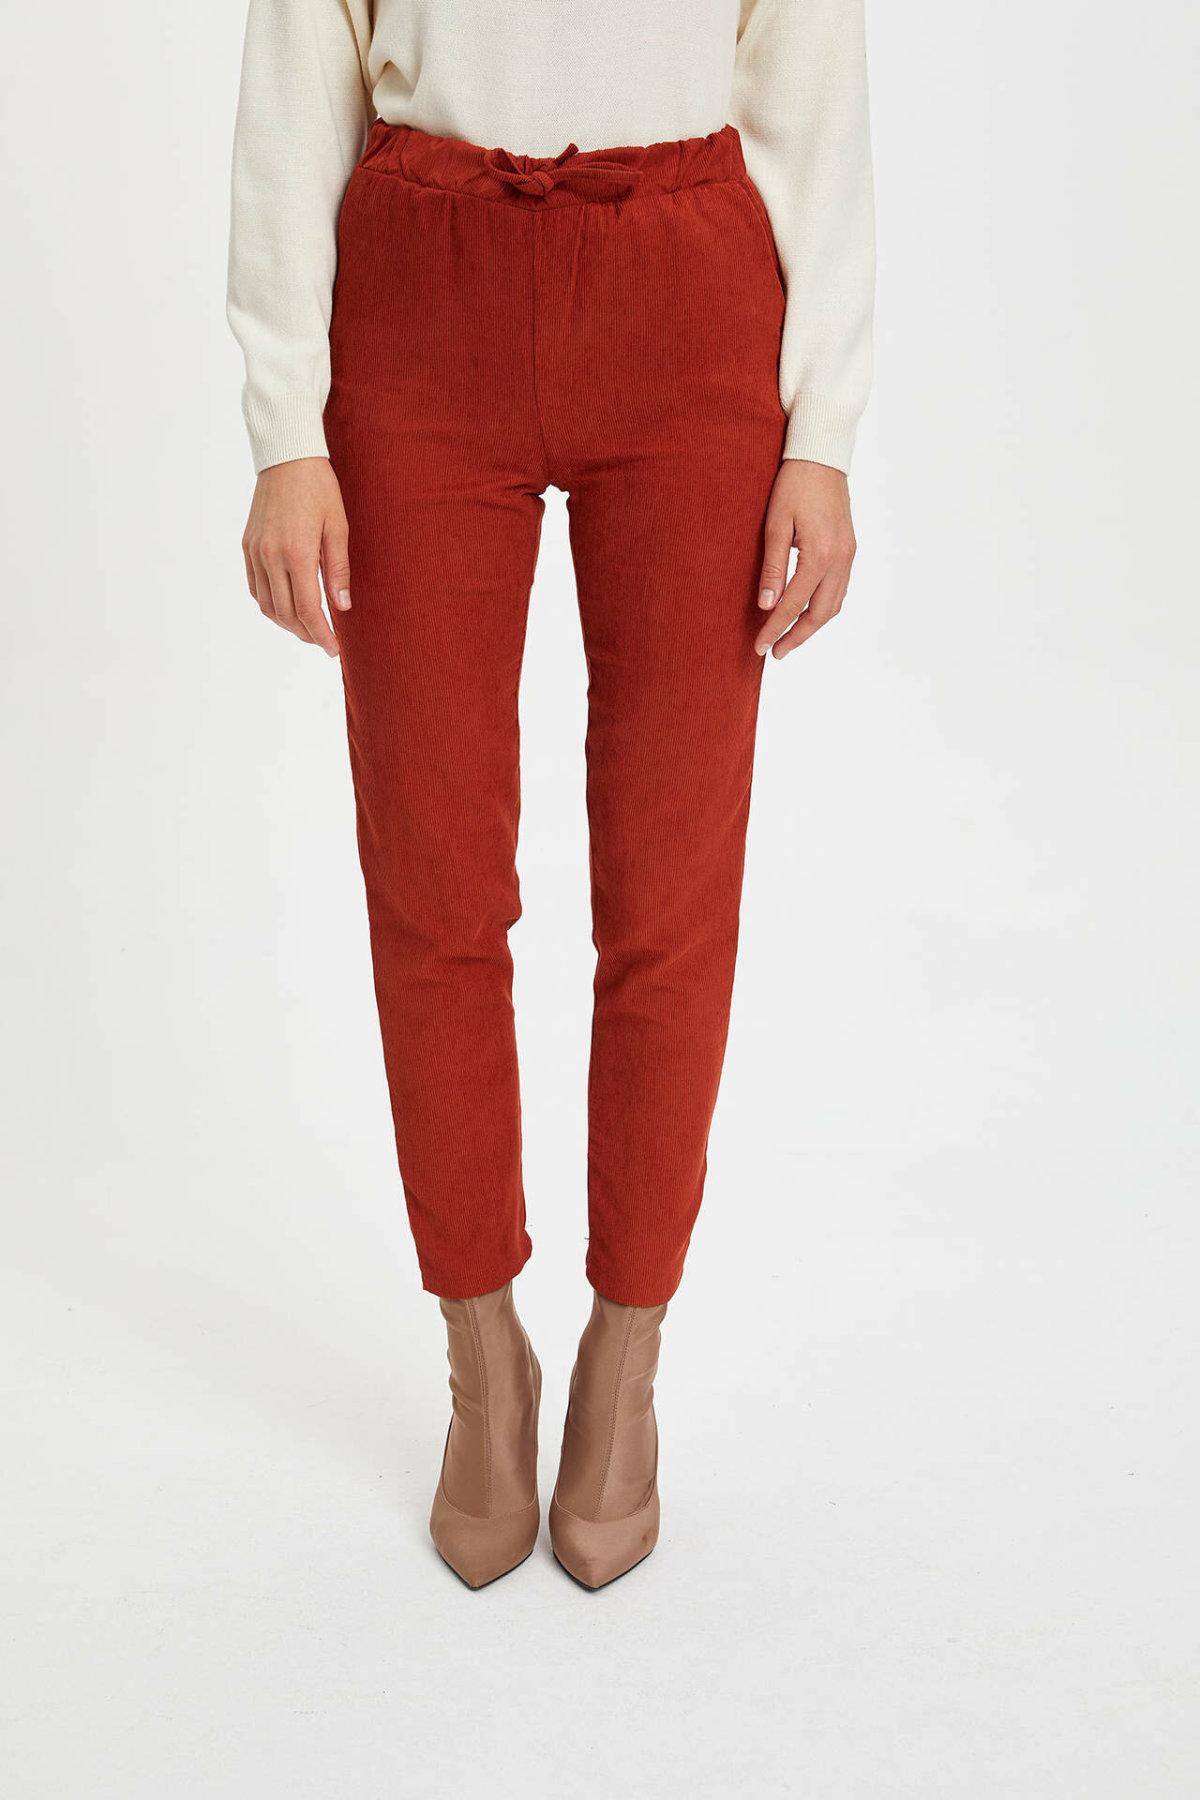 DeFacto Woman Fashion Skinny Trousers Women Corduroy Slim Long Pants Mid-waist Casual Female Bottoms-M8648AZ19WN